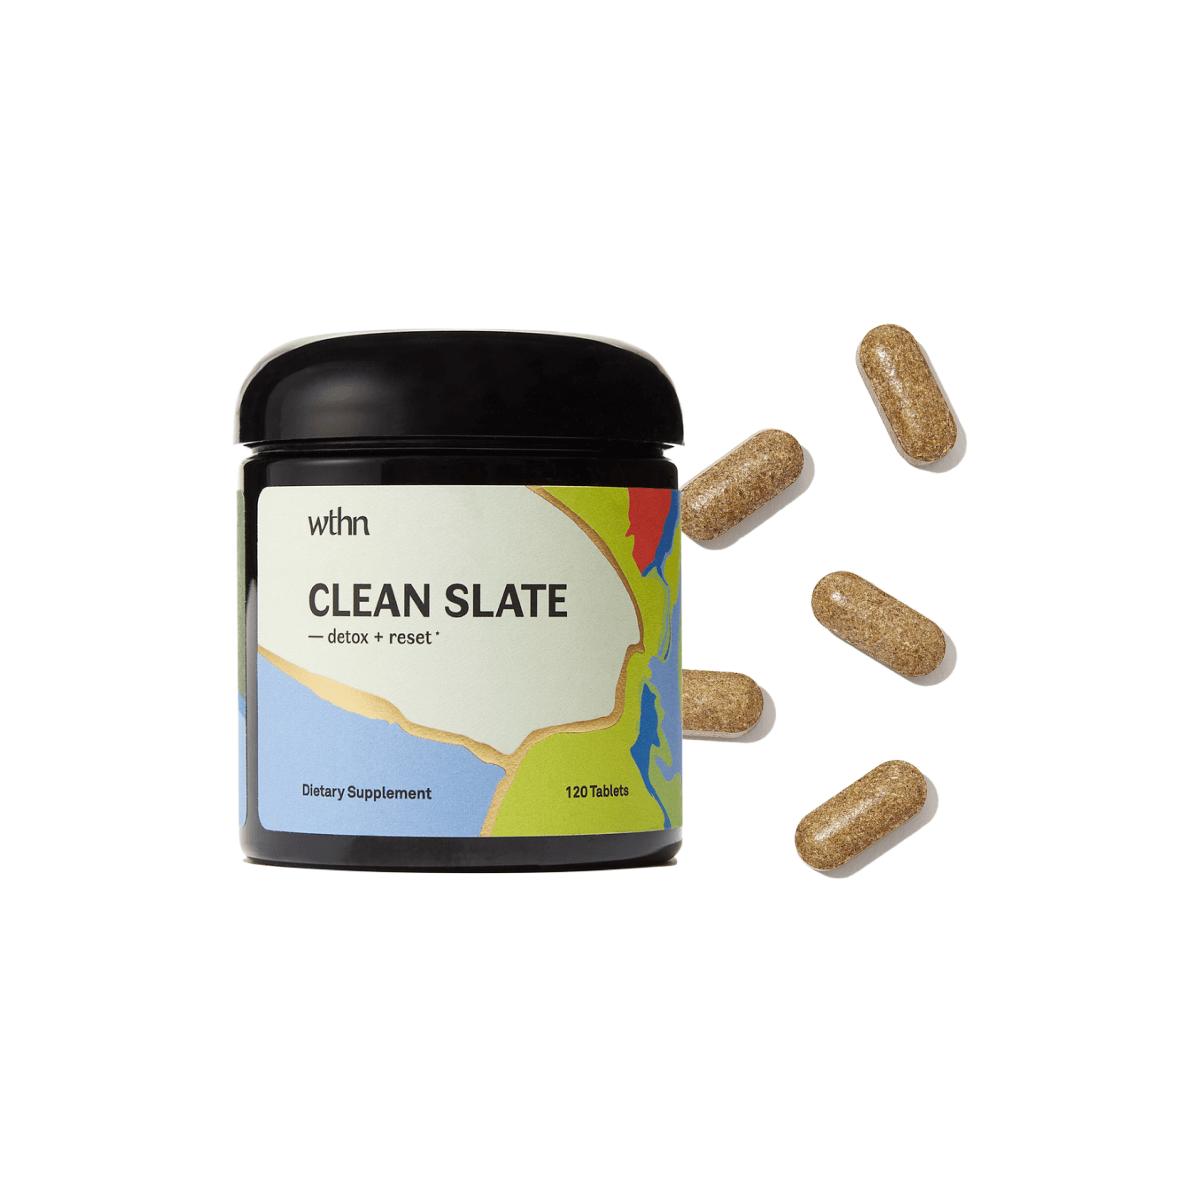 WTHN CLEAN SLAT